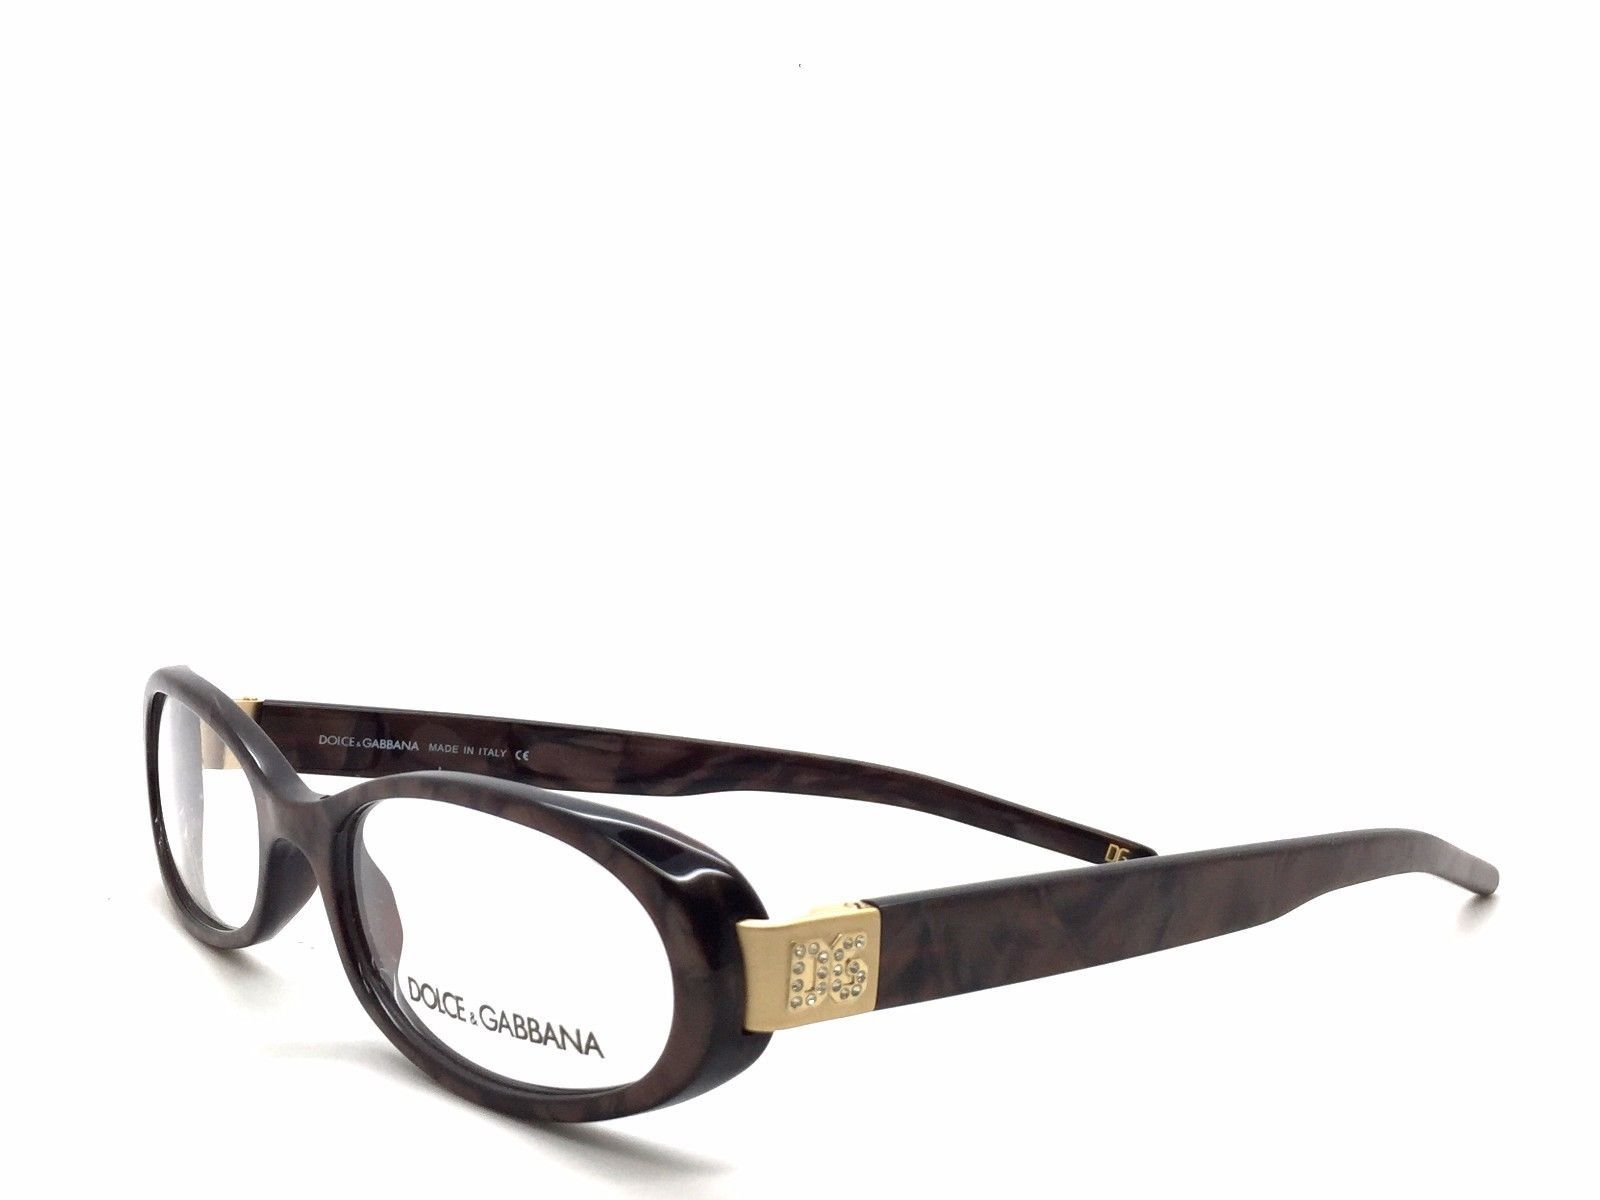 86aa62d3ef9f Dolce   Gabbana Italy Eyeglasses Demo Lenses and 50 similar items. 57